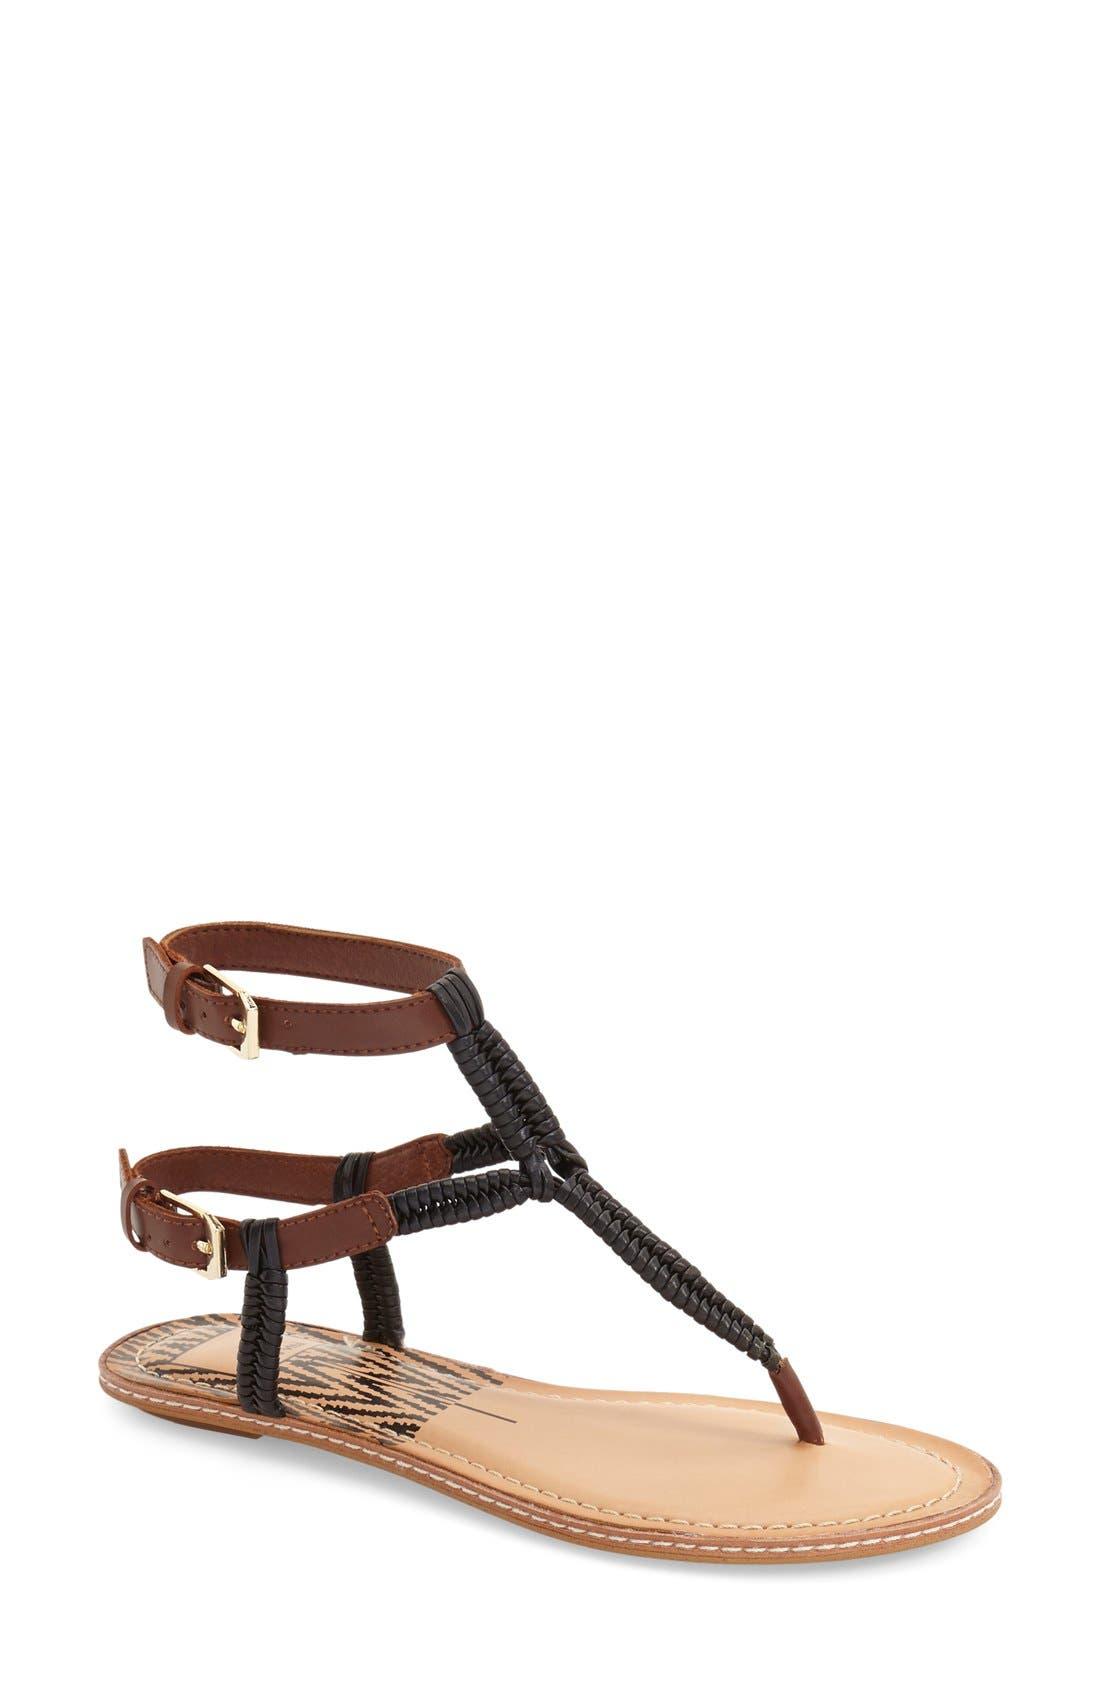 Main Image - Dolce Vita 'Kendra' Flat Sandal (Women)